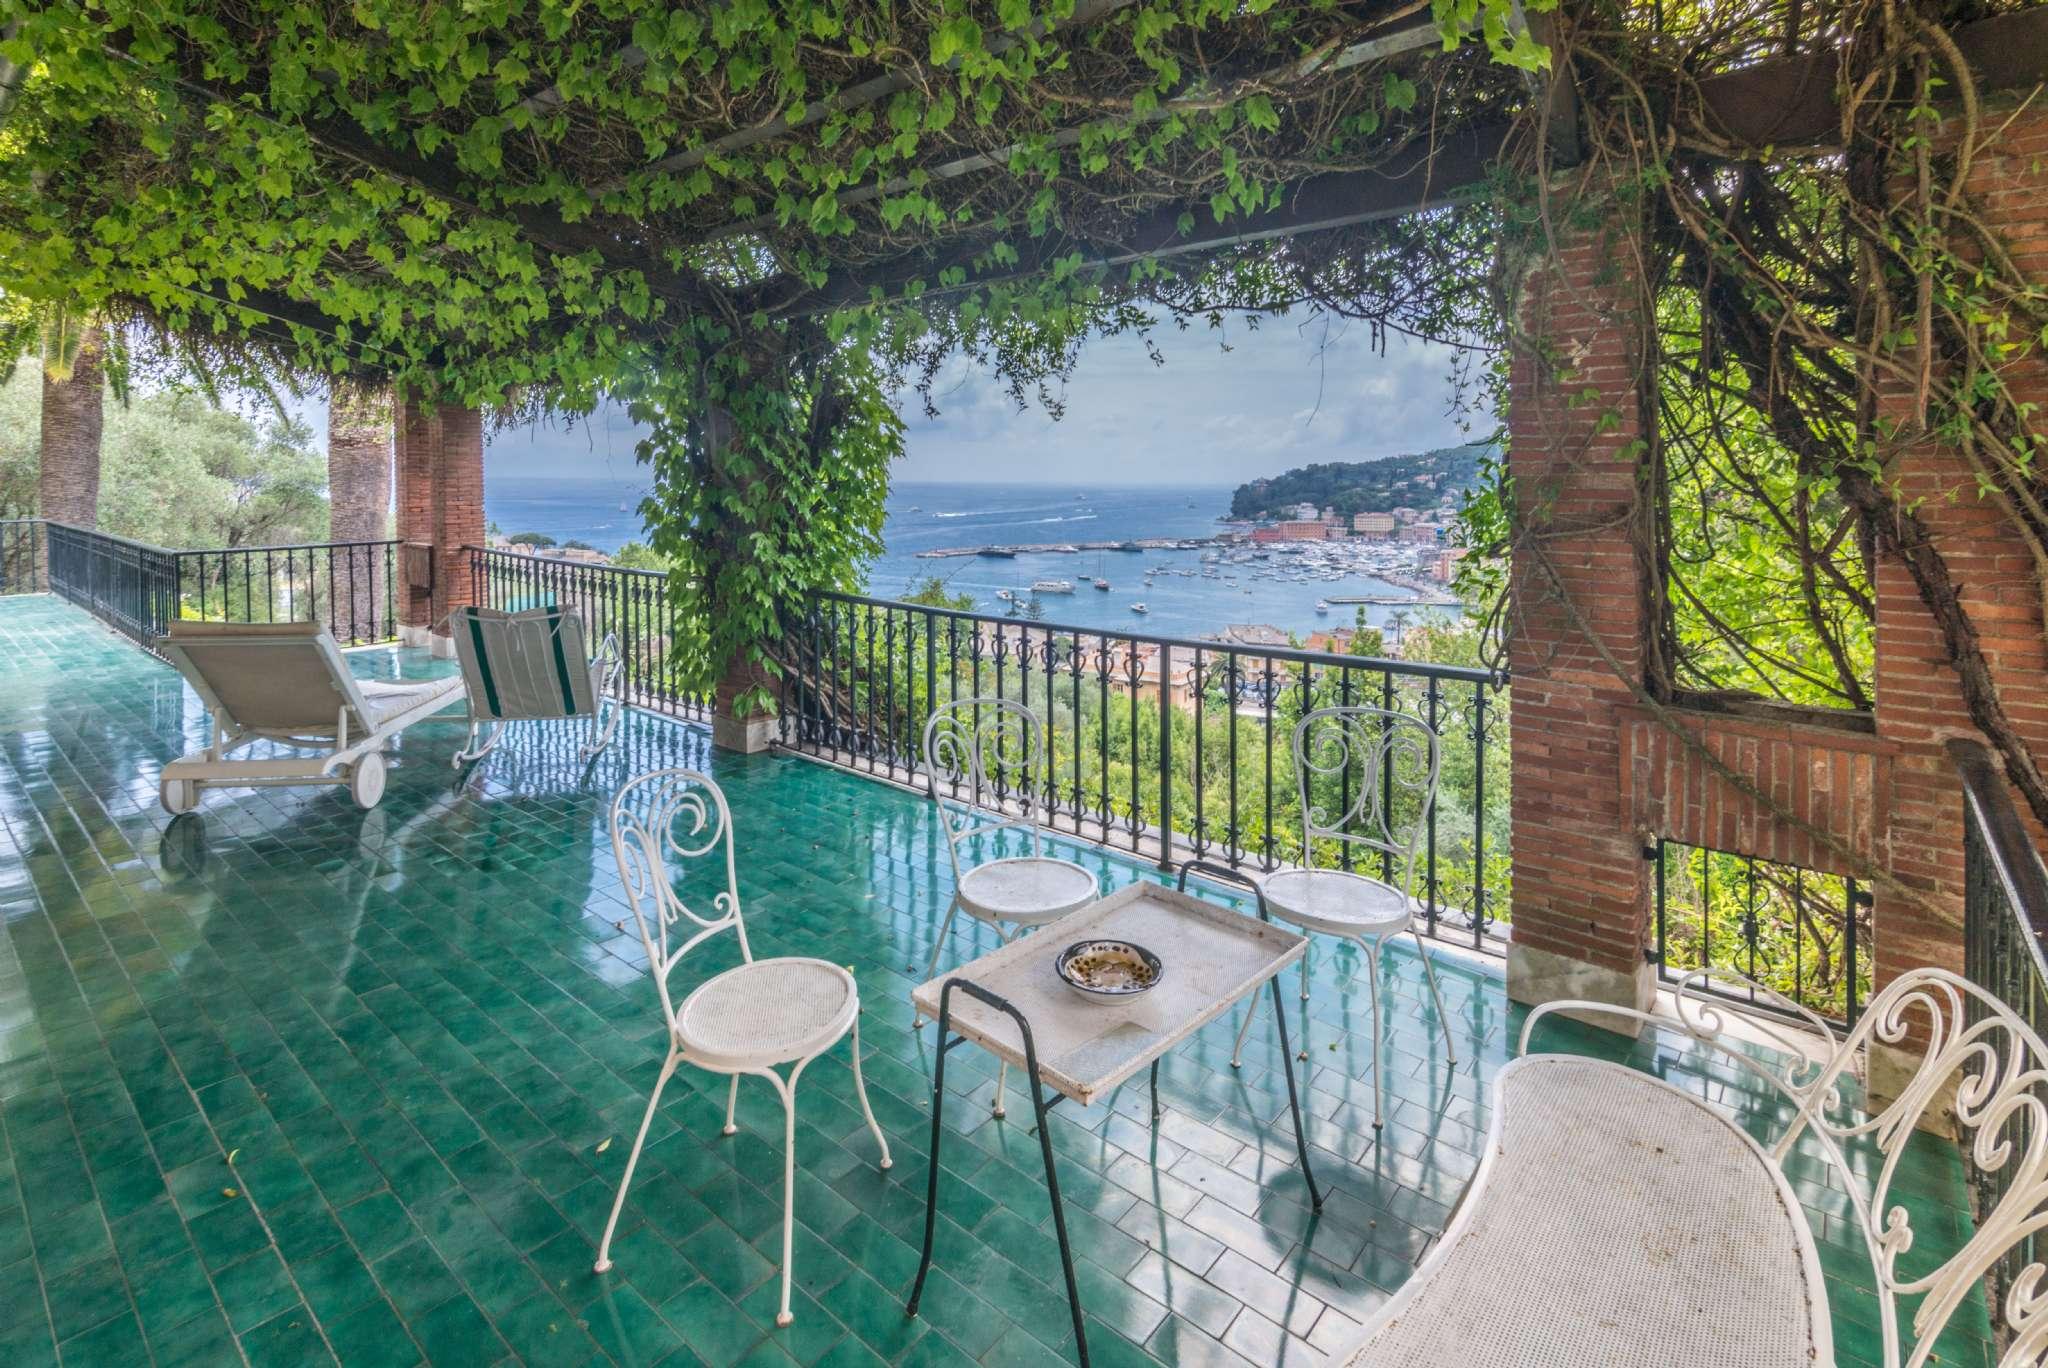 Villa in Vendita a Santa Margherita Ligure: 0 locali, 530 mq - Foto 6